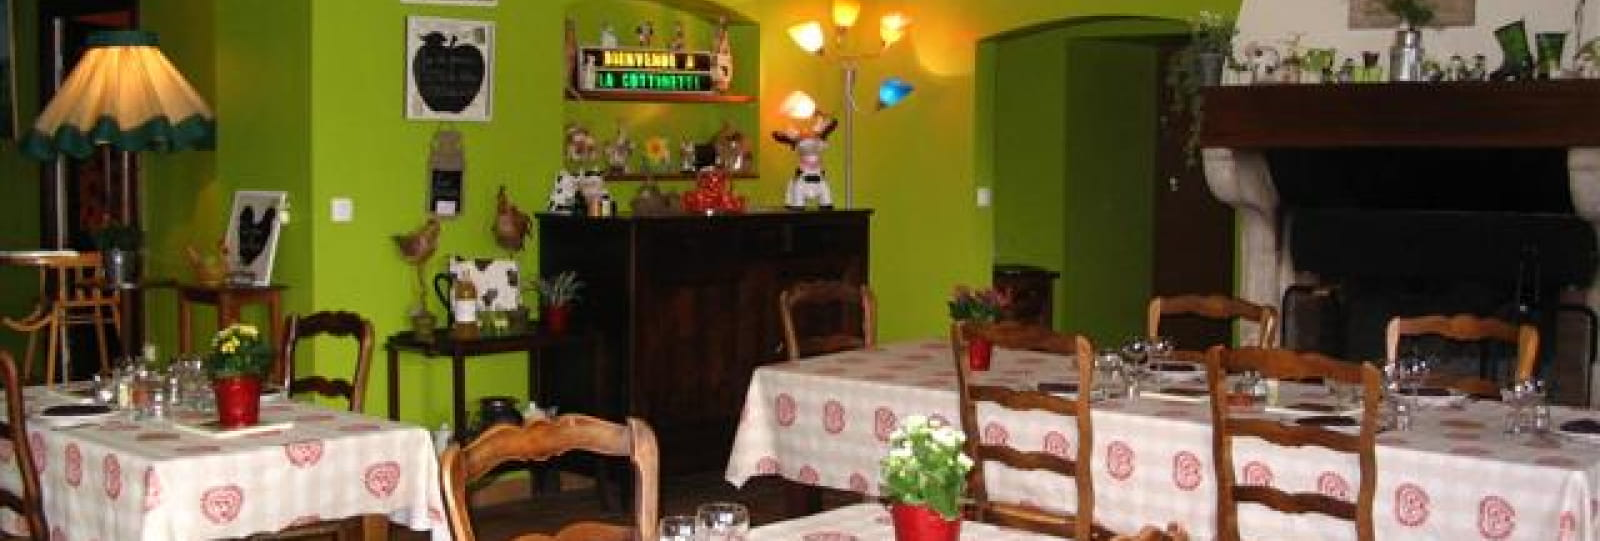 Ferme-Auberge La Cottinette